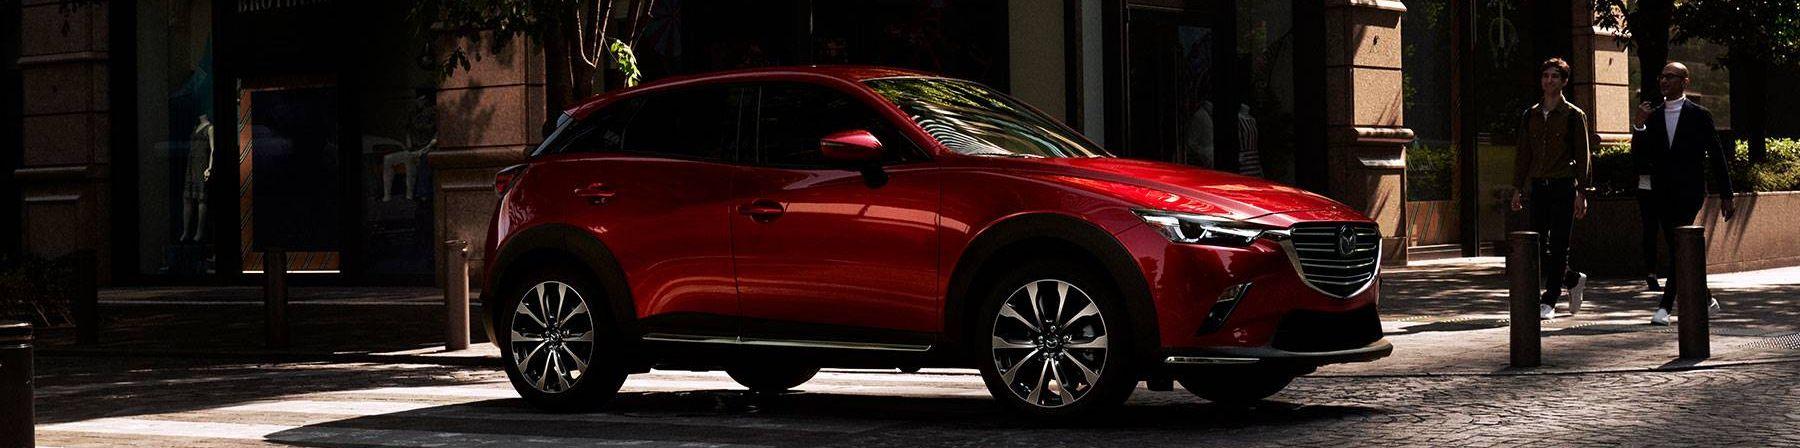 2019 Mazda CX-3 Leasing near Mesa, AZ